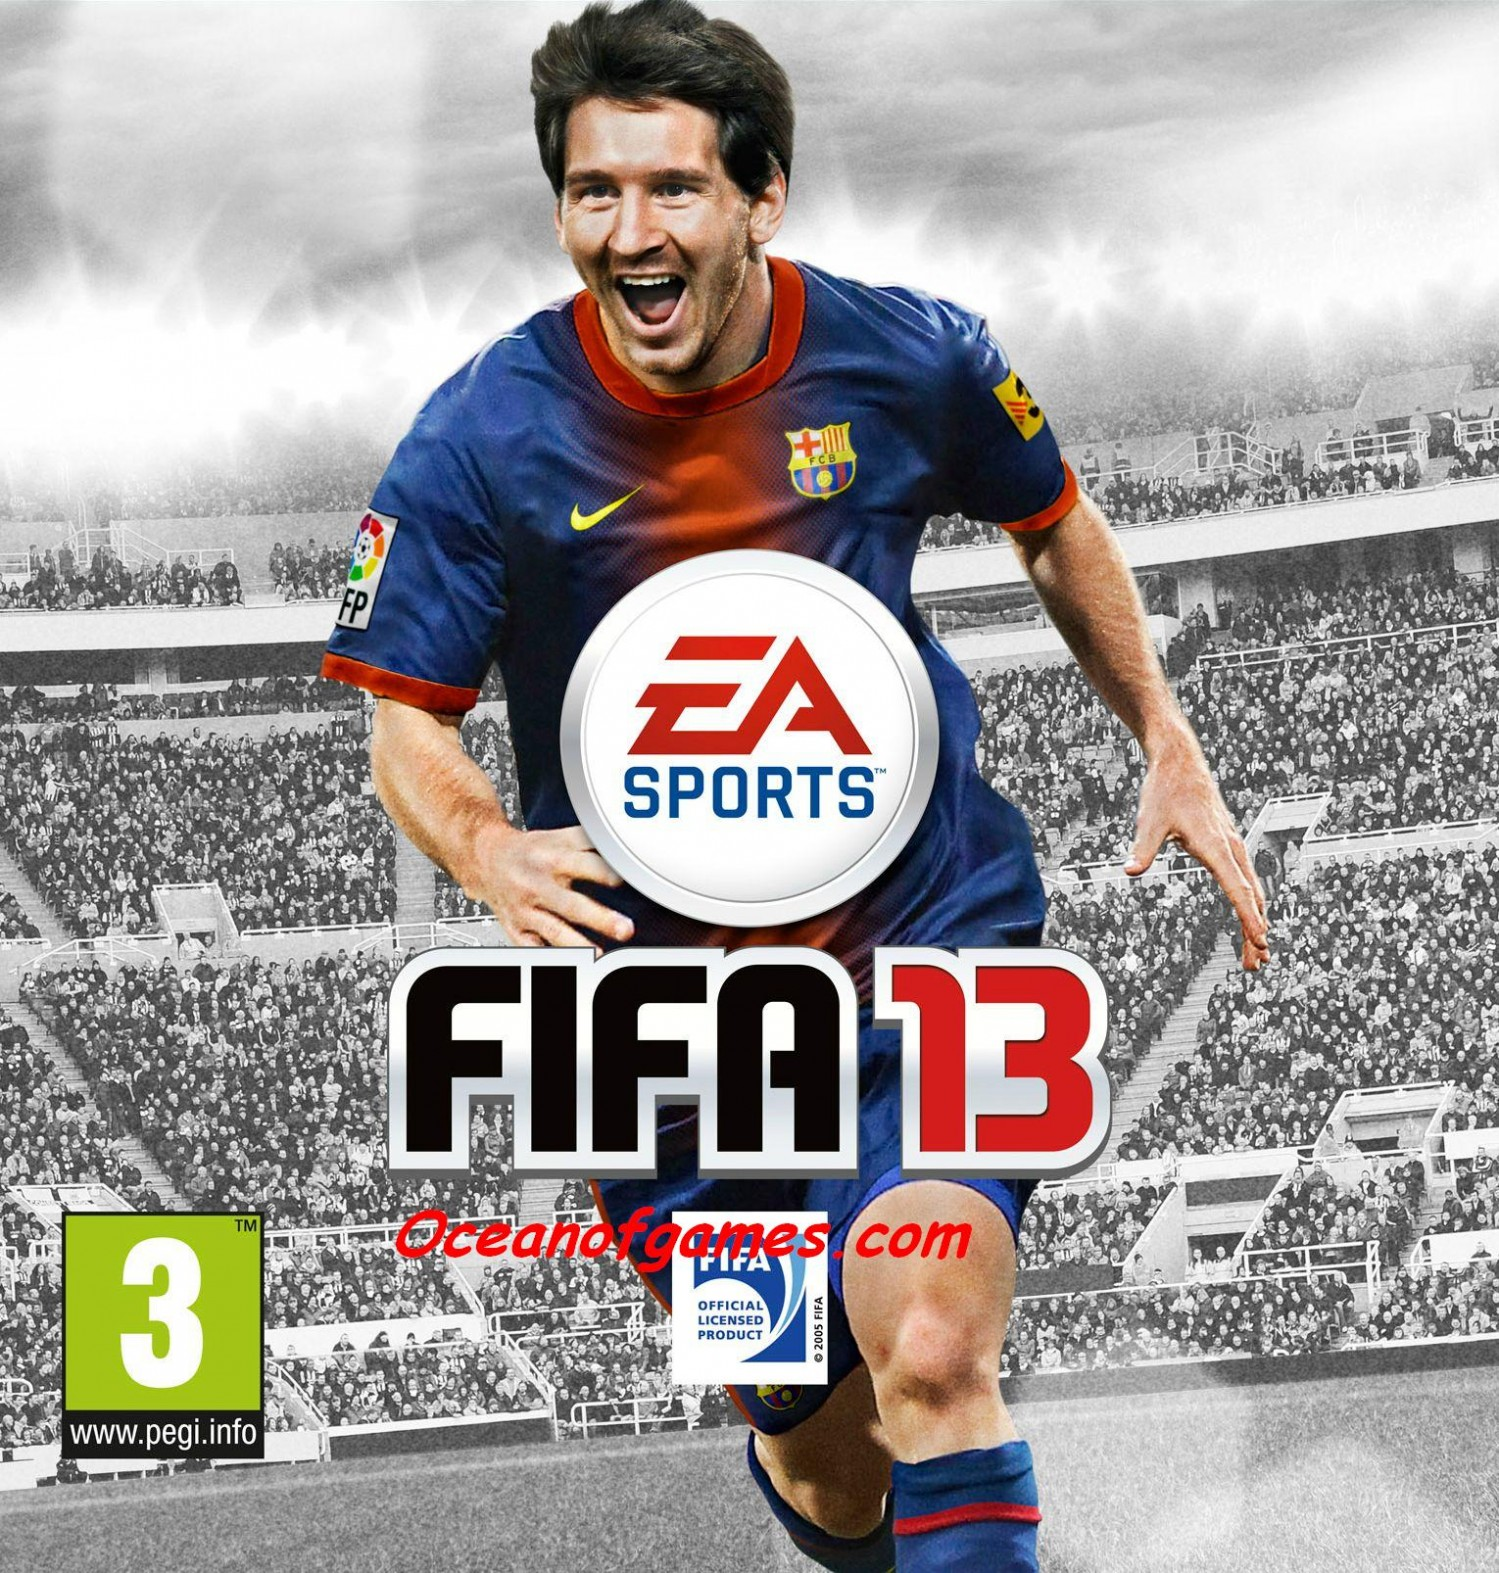 FIFA 13 Free download